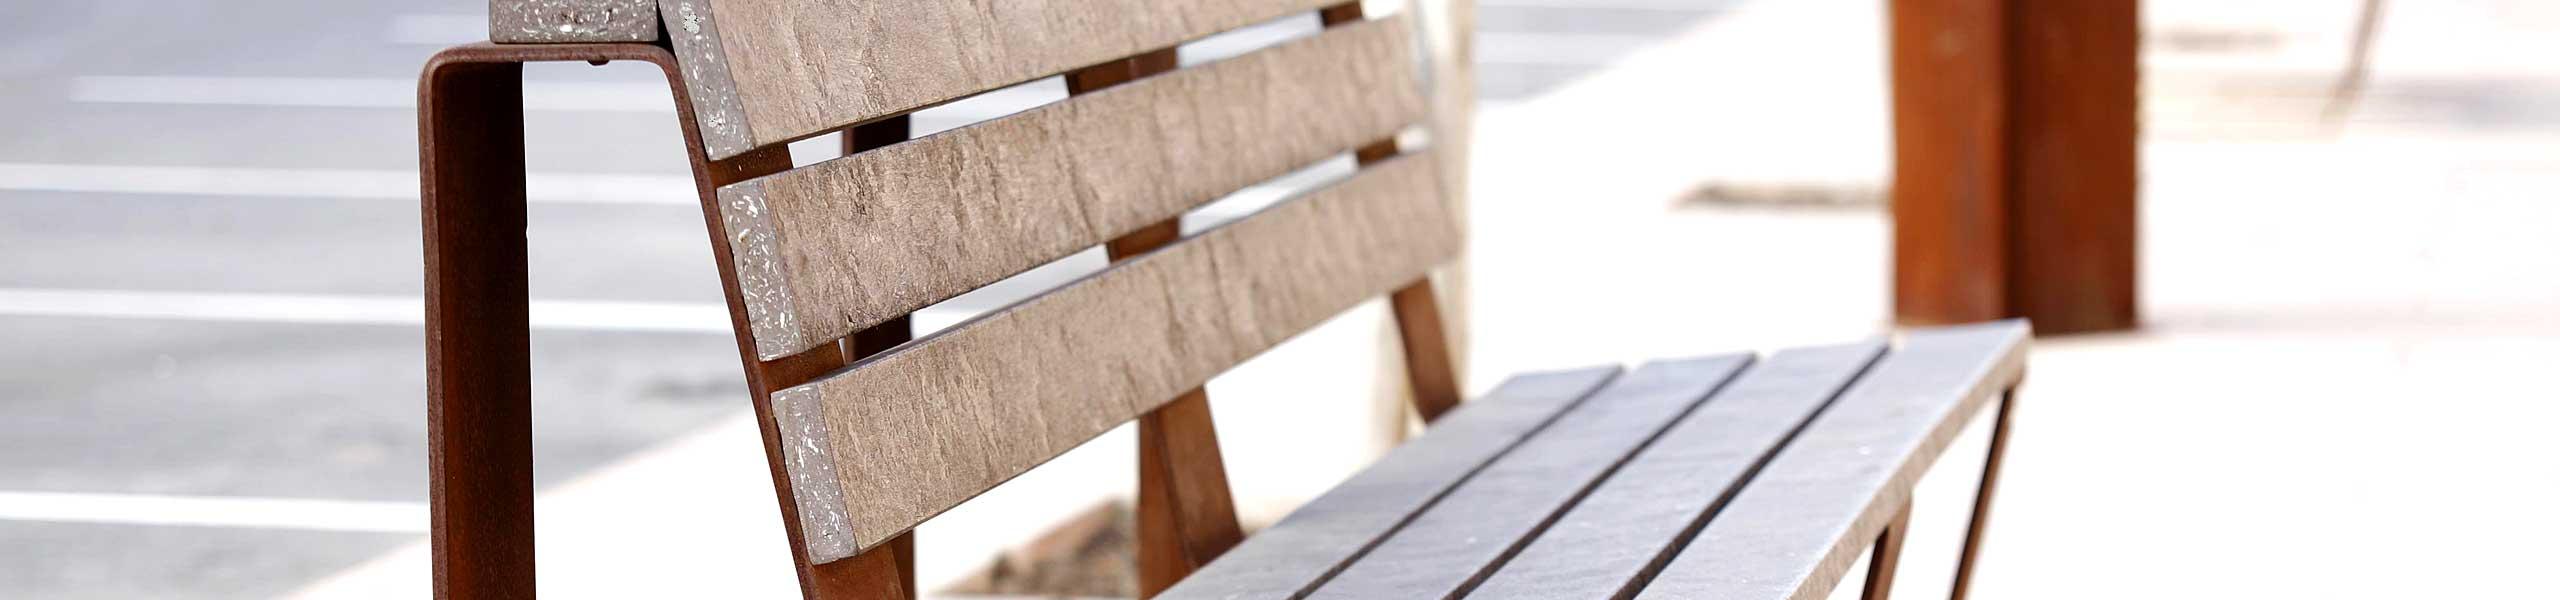 mobiliari urb exterior senyalitzaci grisverdgrisverd nachhaltige stadt m bel. Black Bedroom Furniture Sets. Home Design Ideas